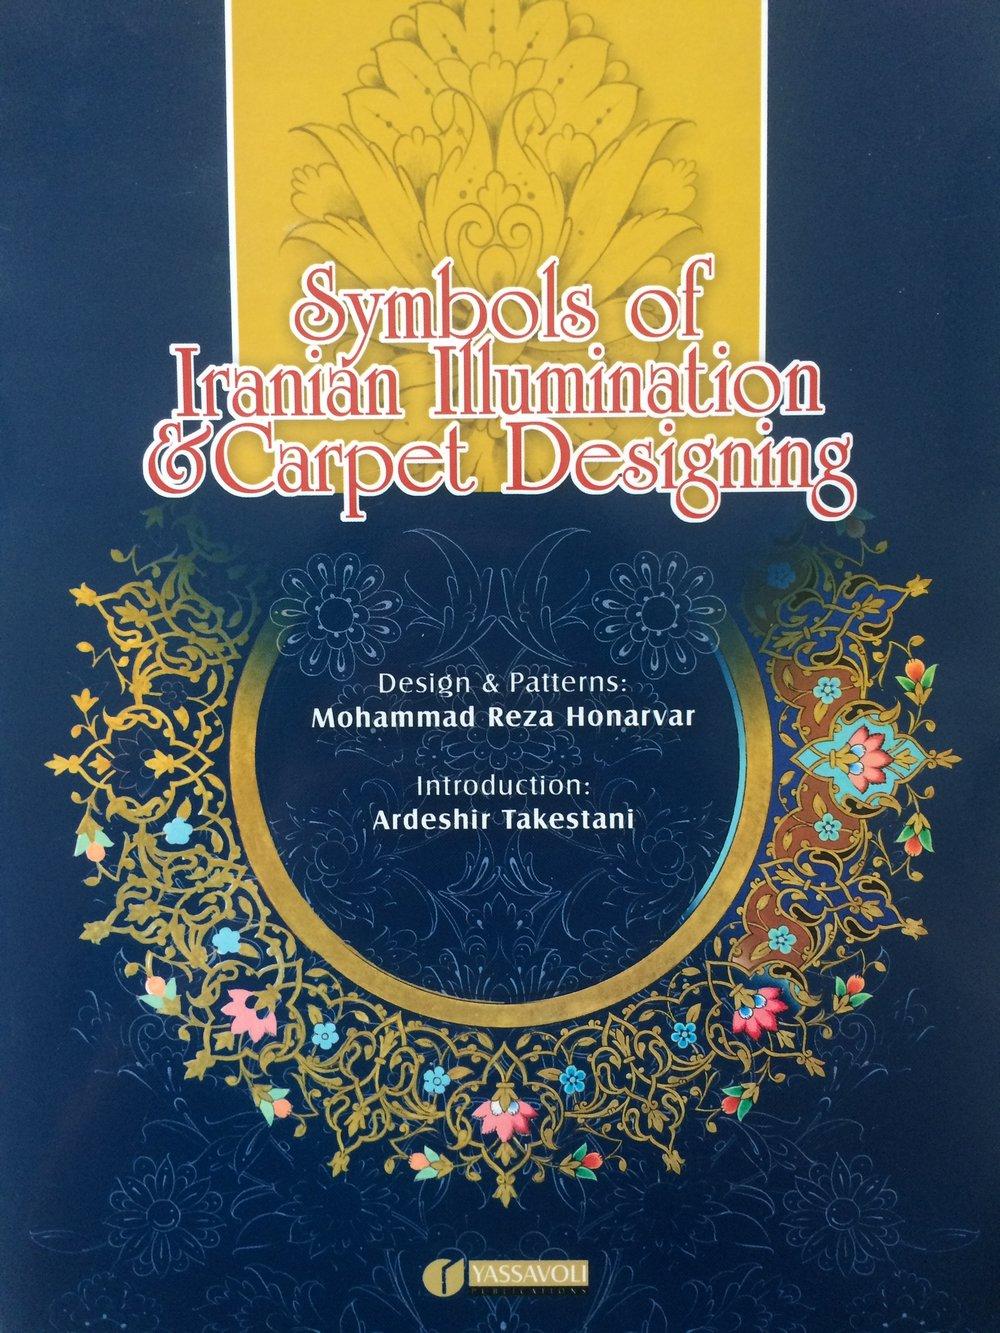 Symbols of Iranian Illumination and Carpet Design